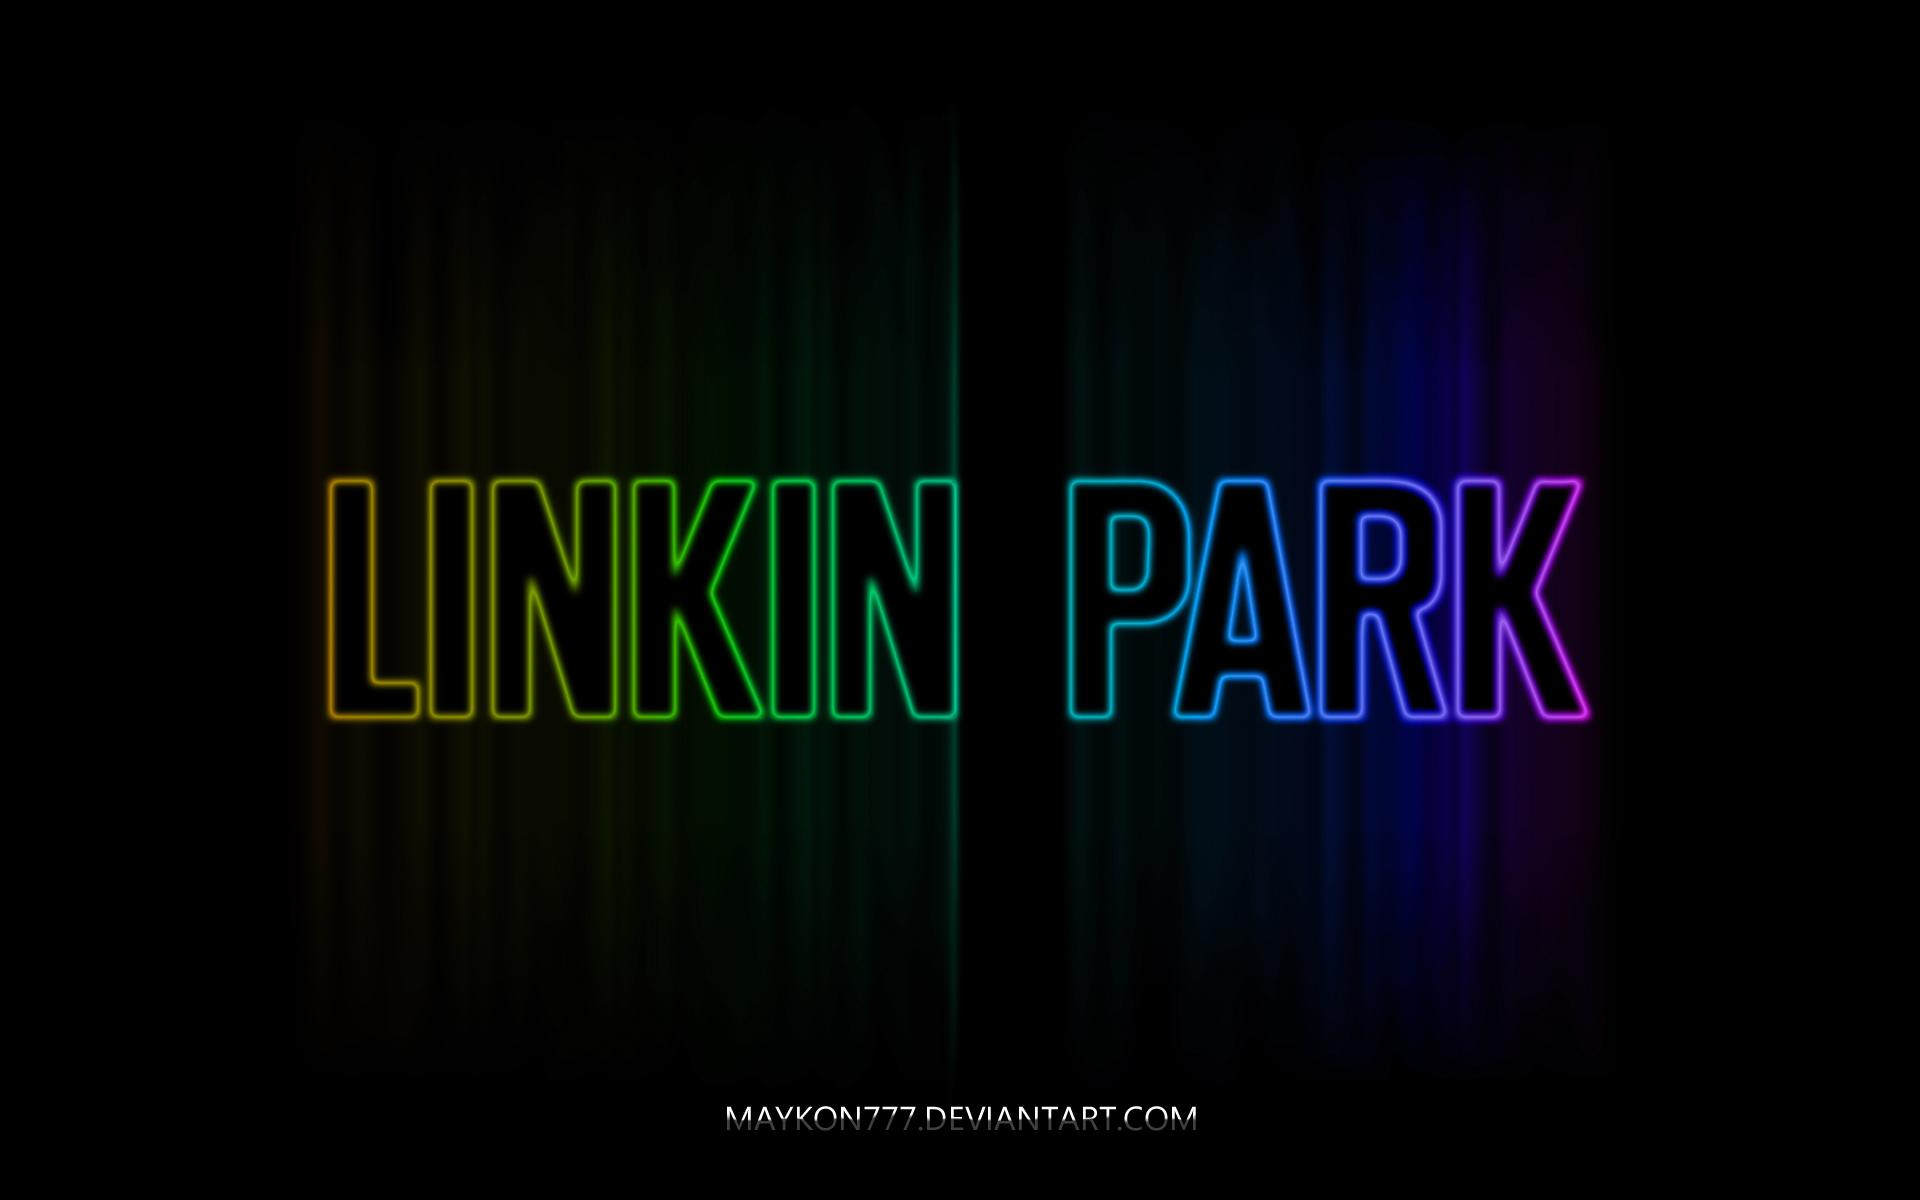 linkin park logo 4 by maykon777 customization wallpaper hdtv 1920x1200